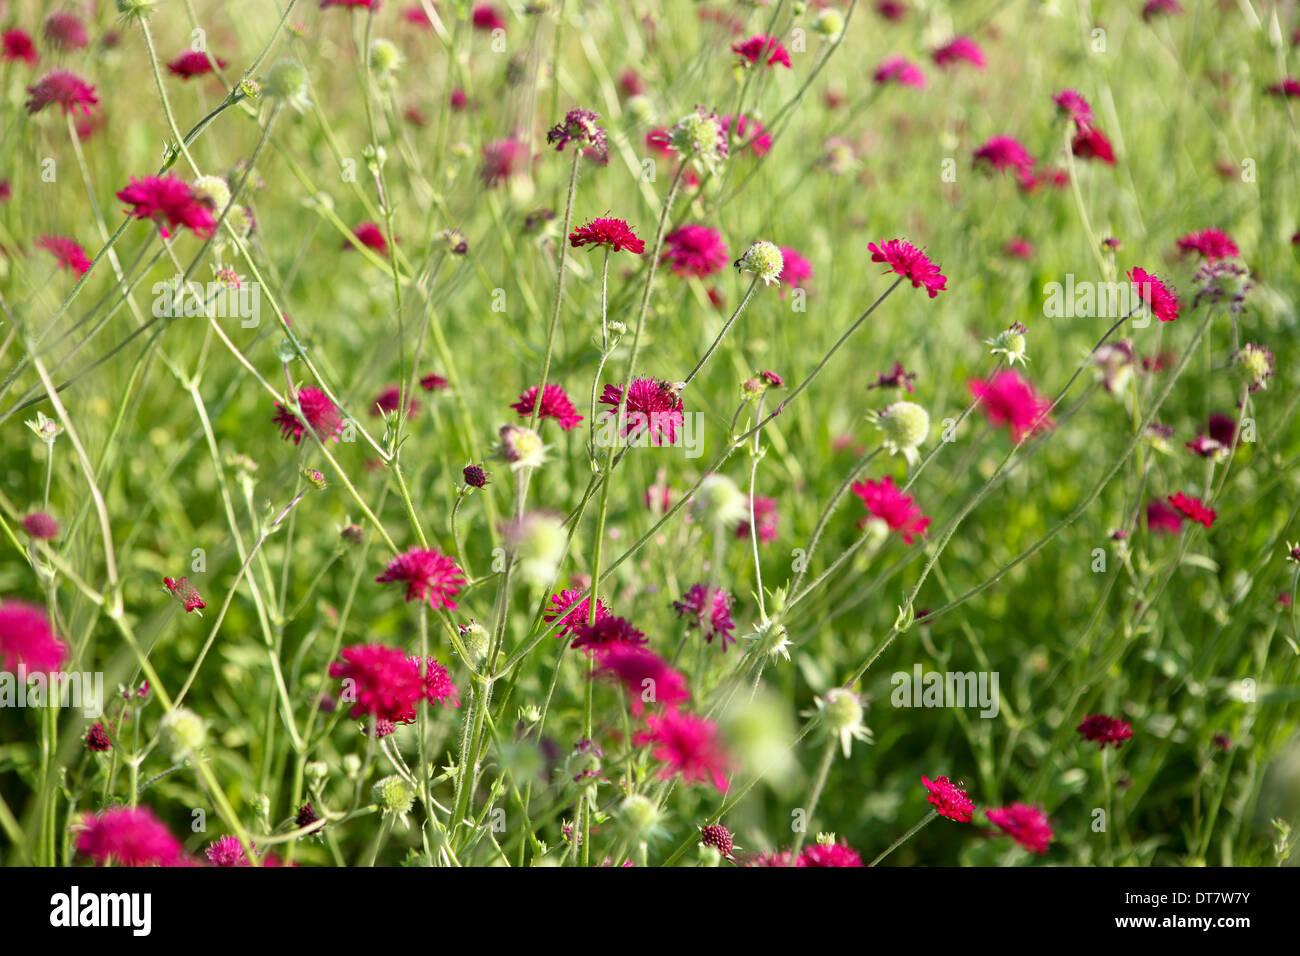 Knautia macedonica / Macedonian scabious - Stock Image